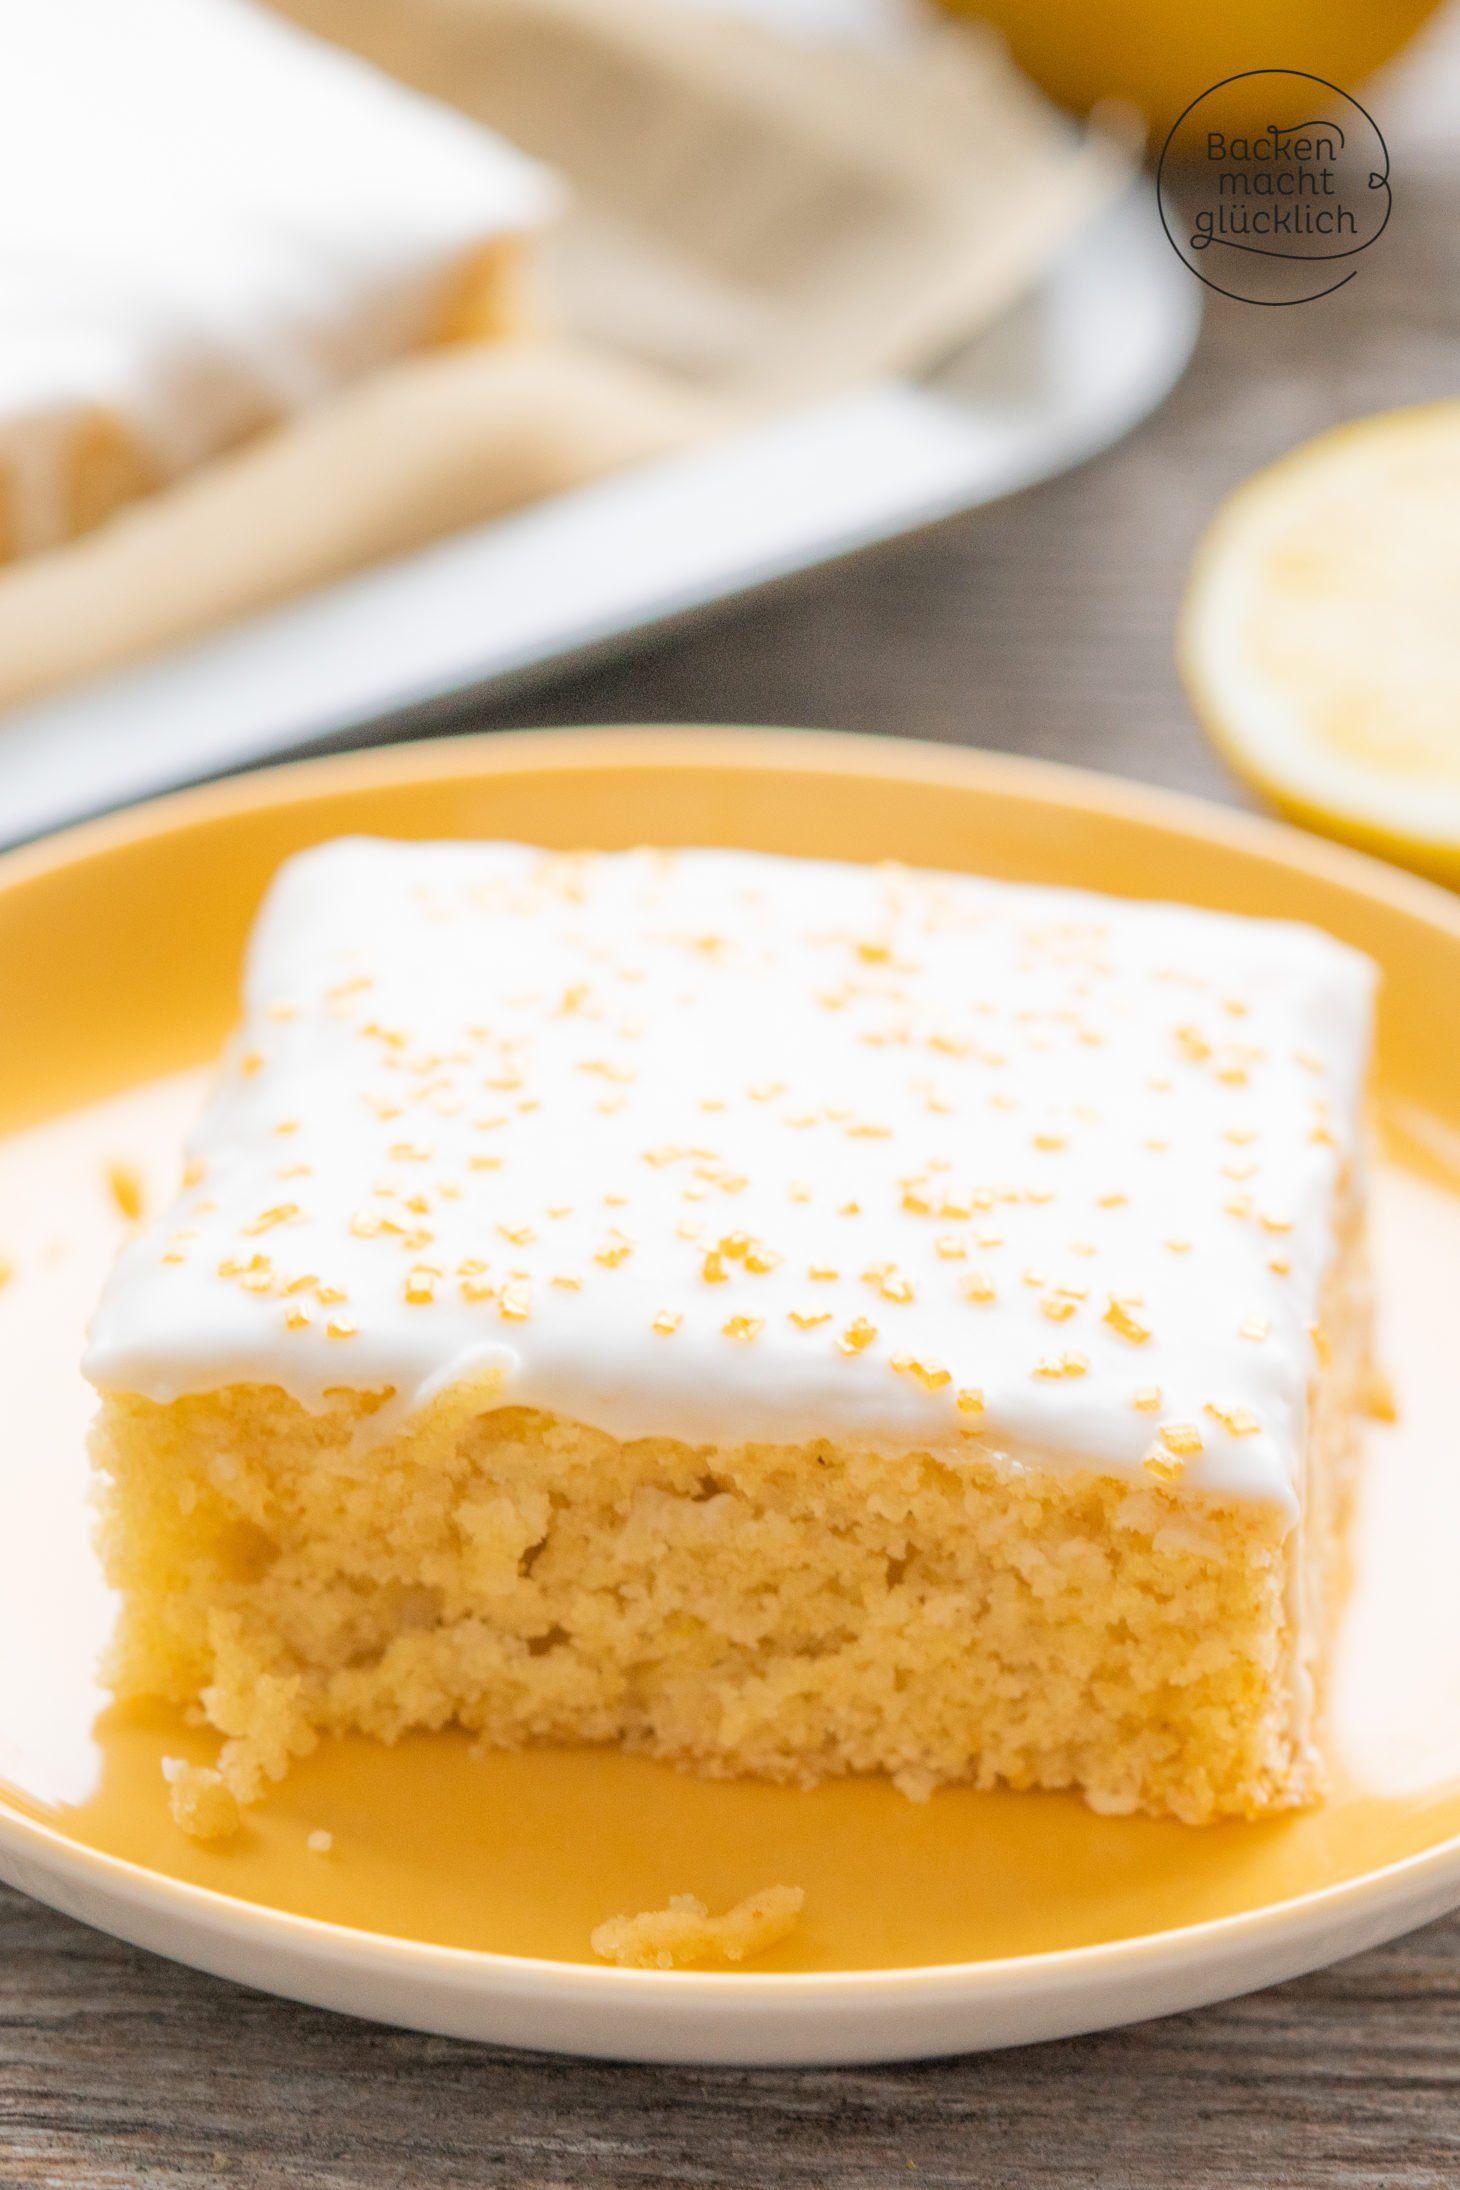 Tolles Rezept Fur Einen Super Einfachen Veganen Zitronenkuchen Der Zitronenkuchen Ohne Ei Zitronenkuchen Ohne Ei Veganer Zitronenkuchen Zitronenkuchen Rezept